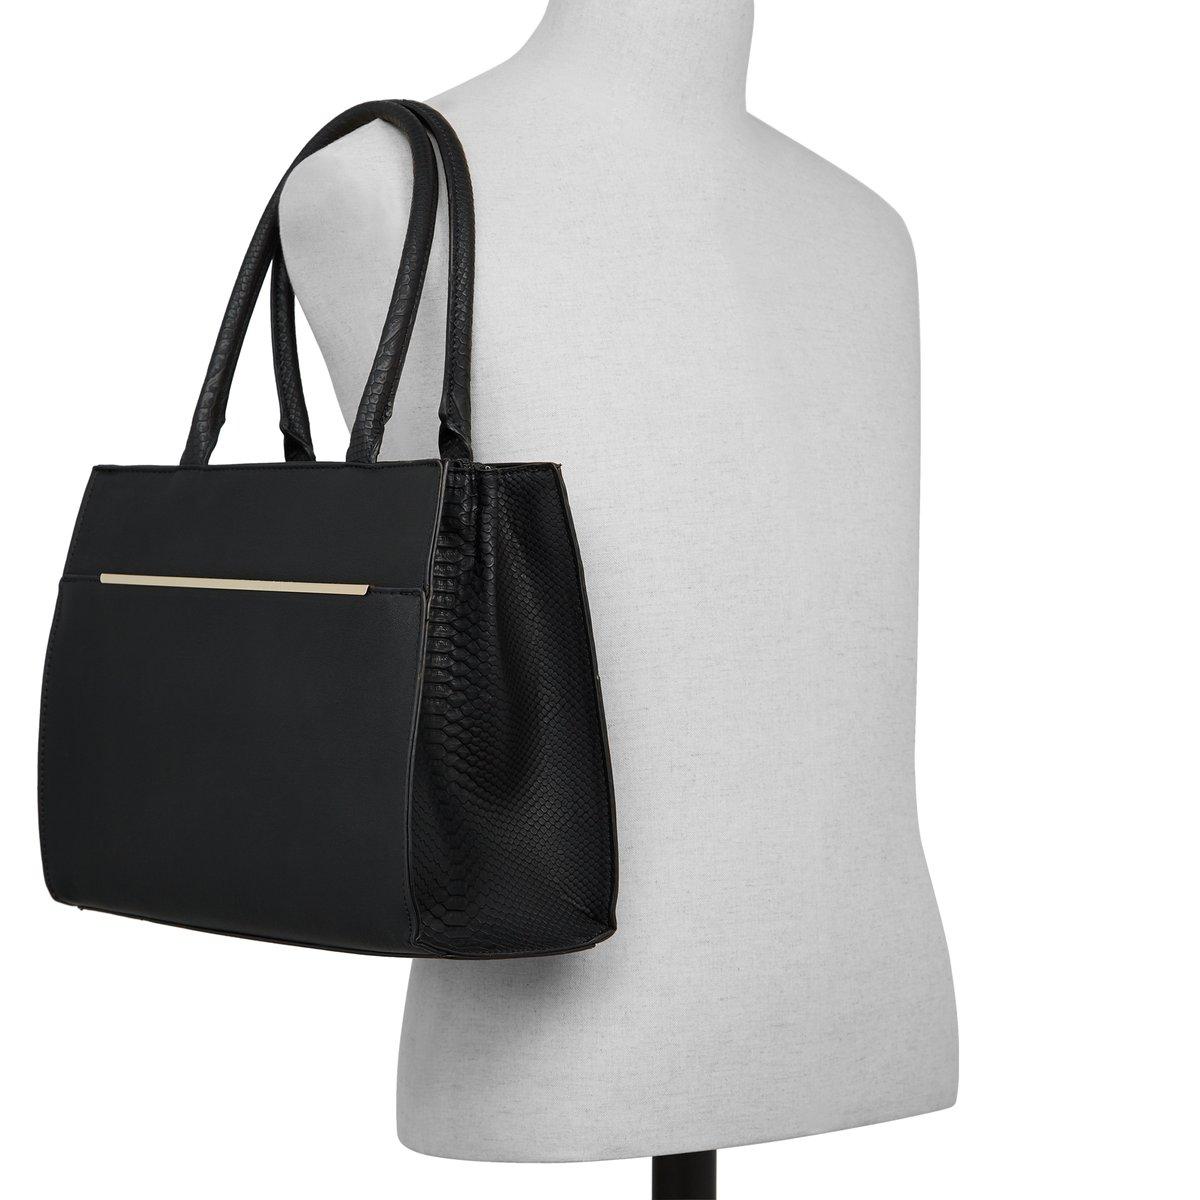 Shoulder Bags Totes